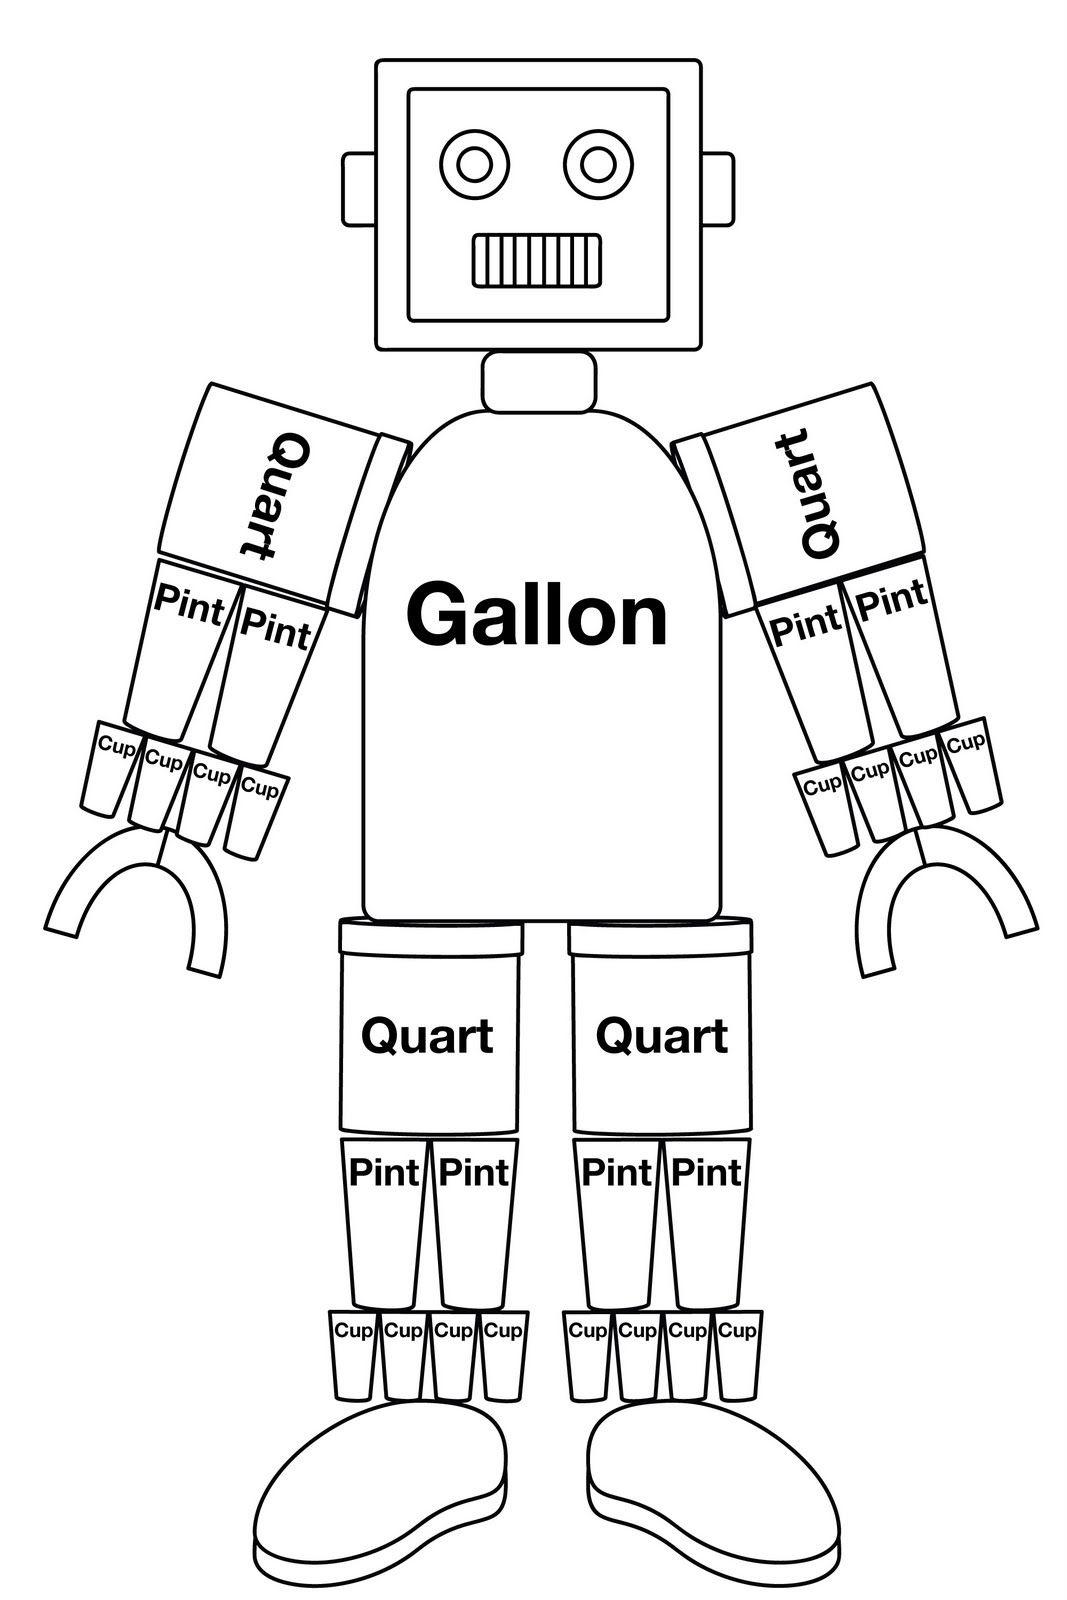 Other Graphical Works | Homeschoolin | 3Rd Grade Math, Teaching Math - Gallon Bot Printable Free